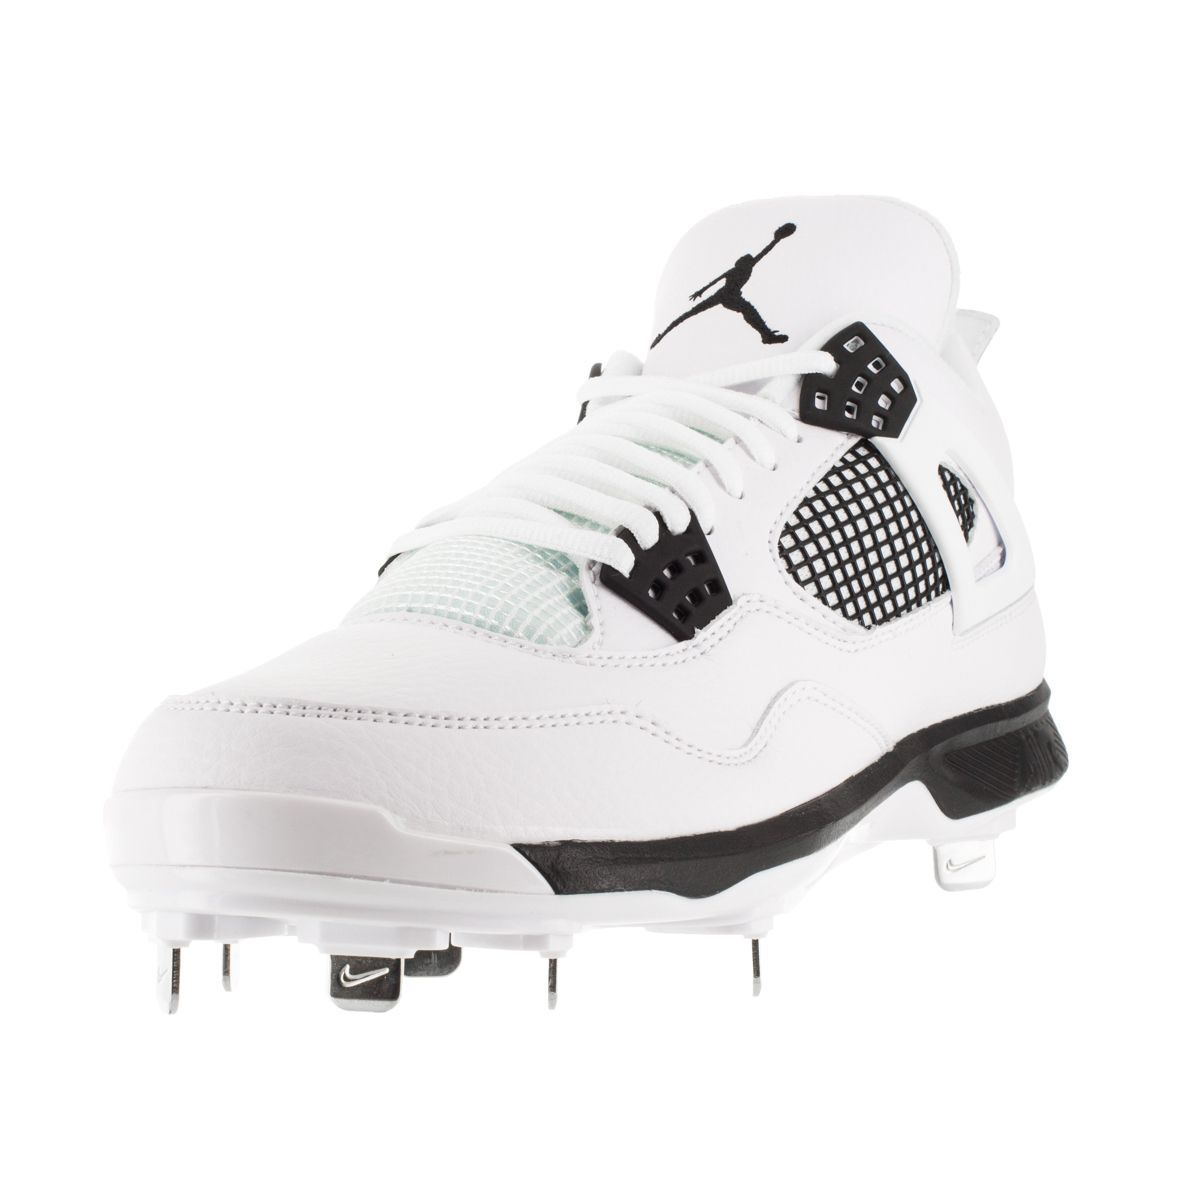 nike air jordan 4 retro white/red/black softball